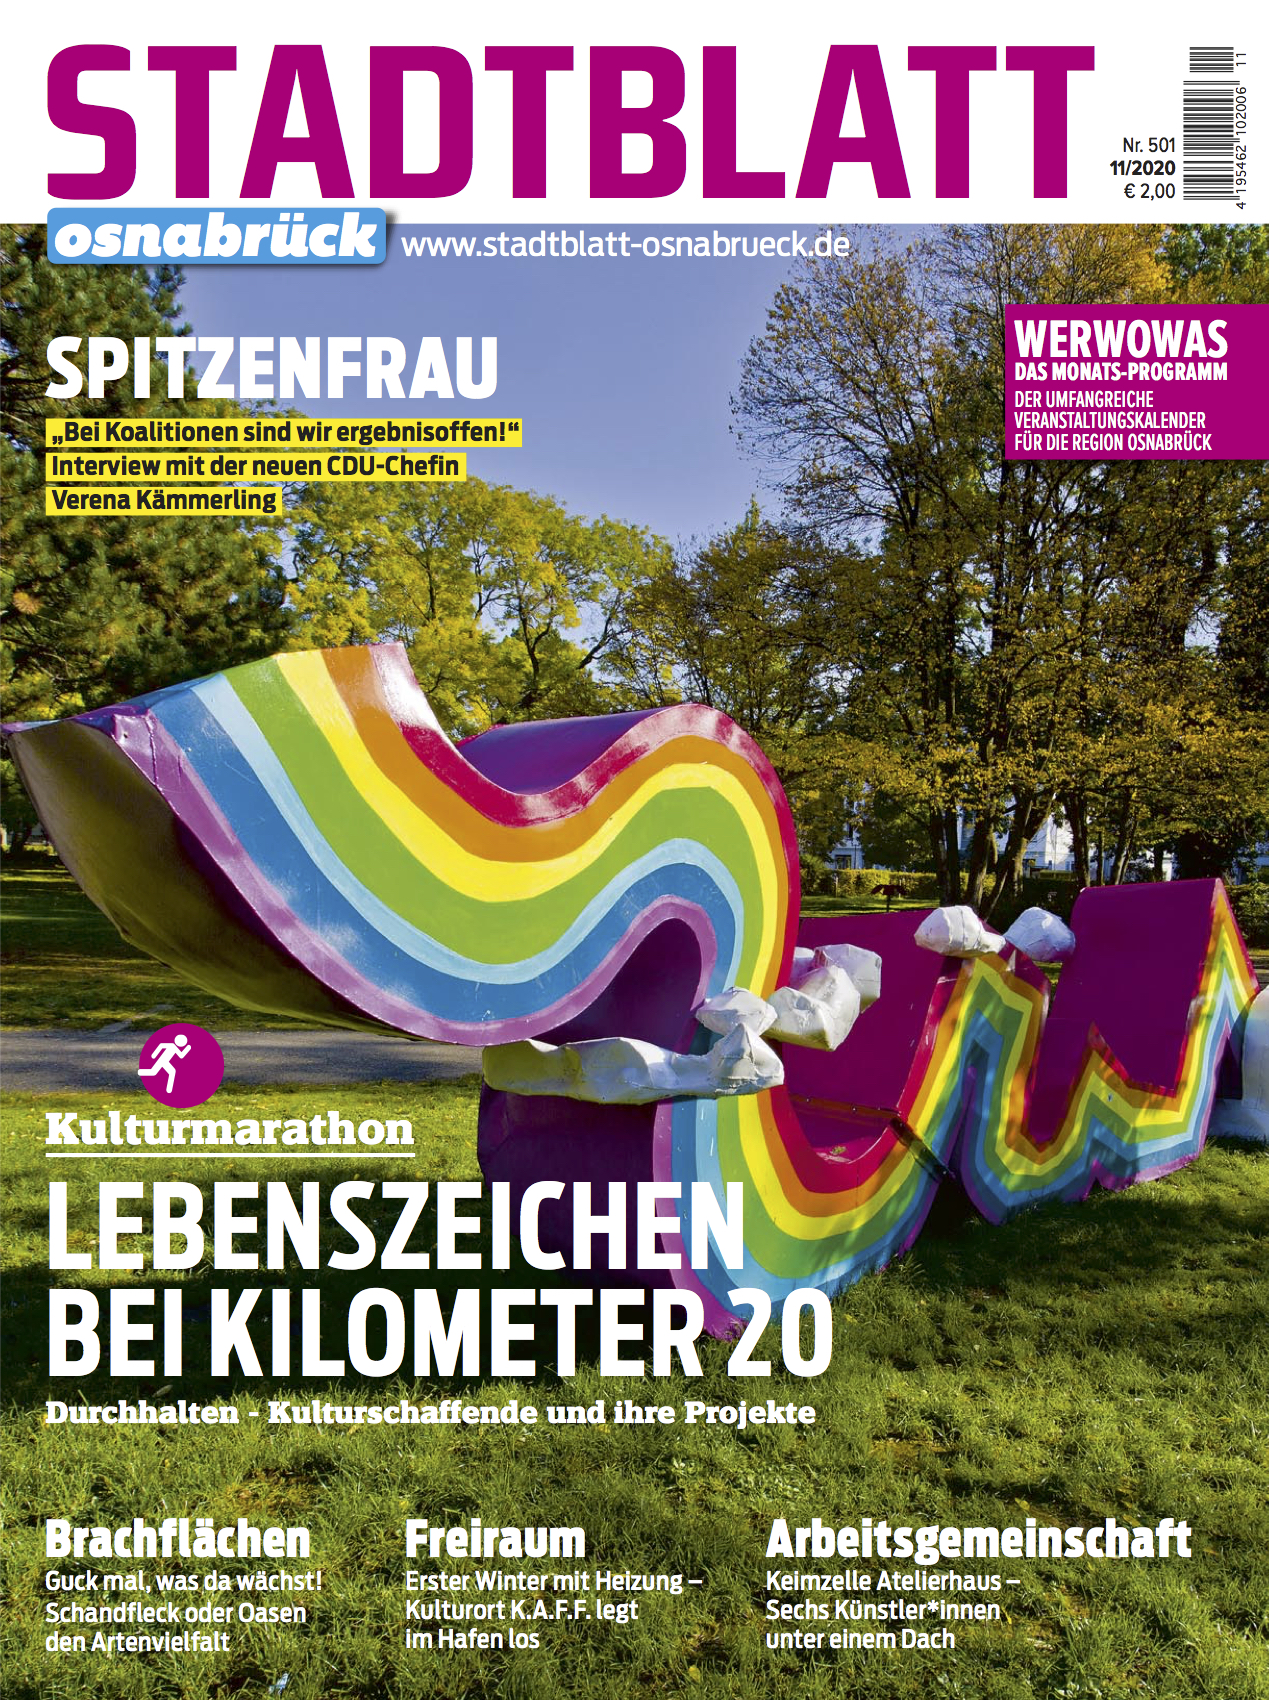 Stadtblatt_2020_11